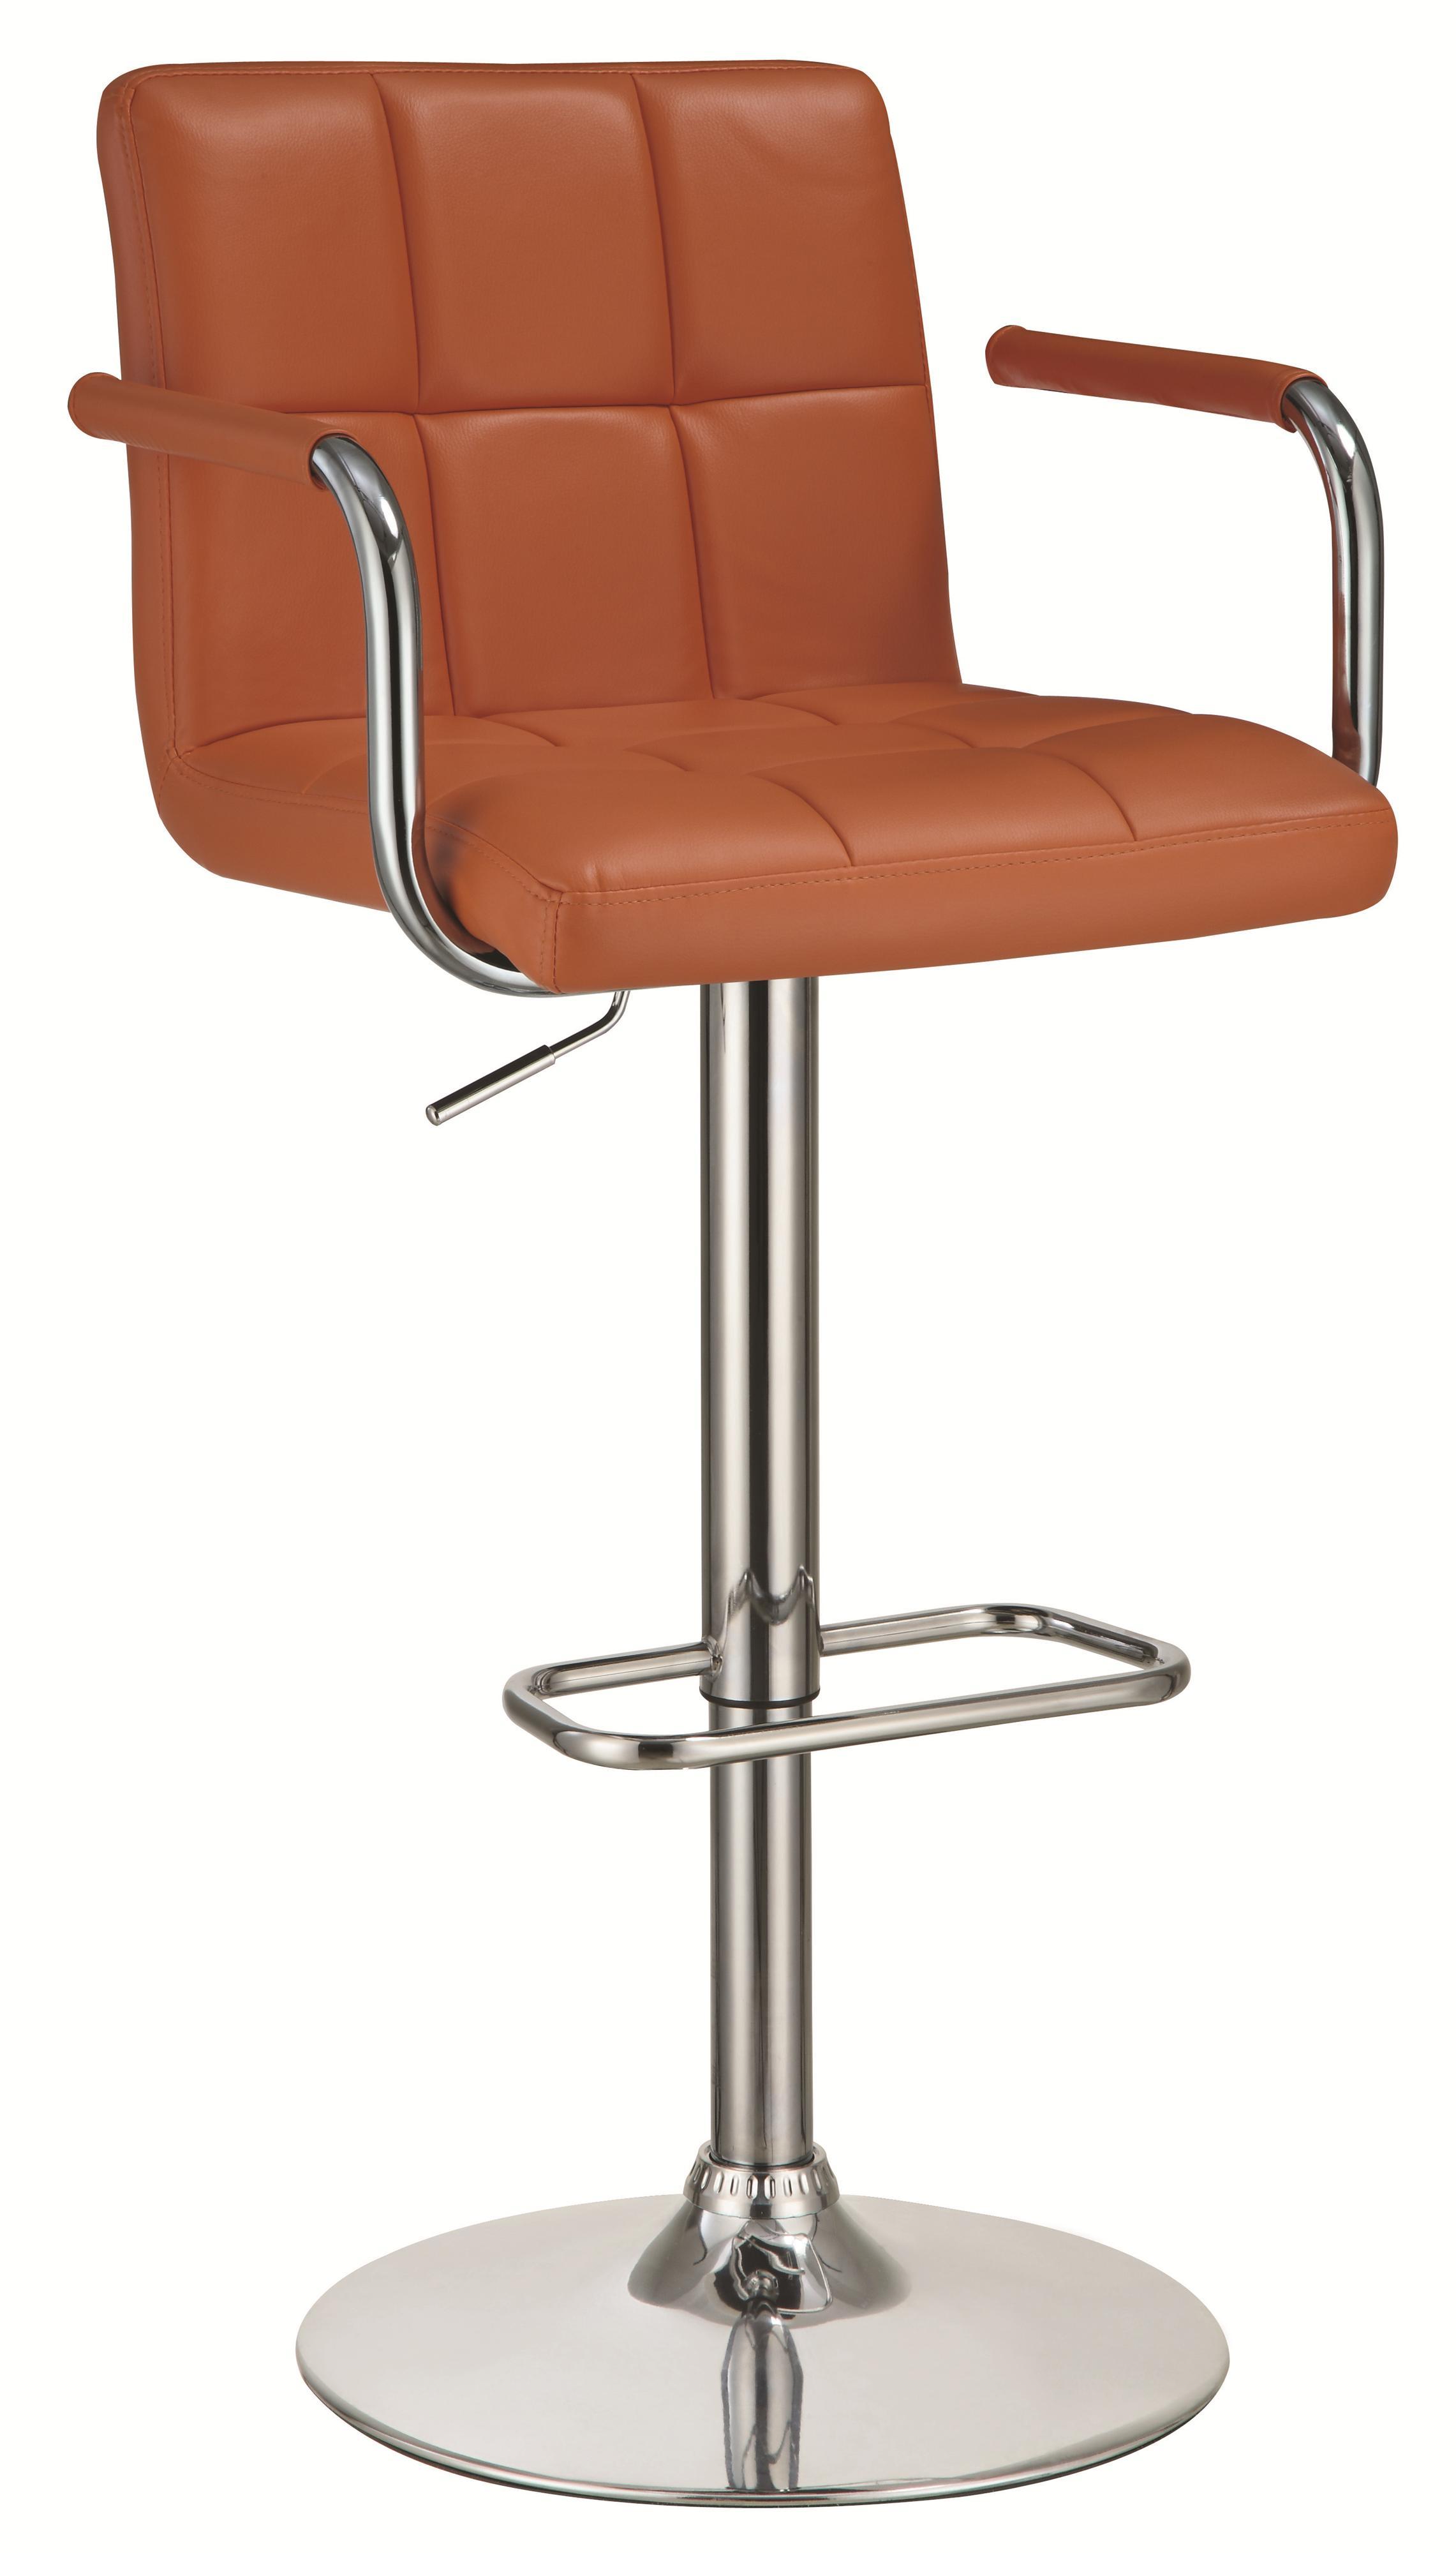 Coaster Bar Units and Bar Tables Bar Stool - Item Number: 121098